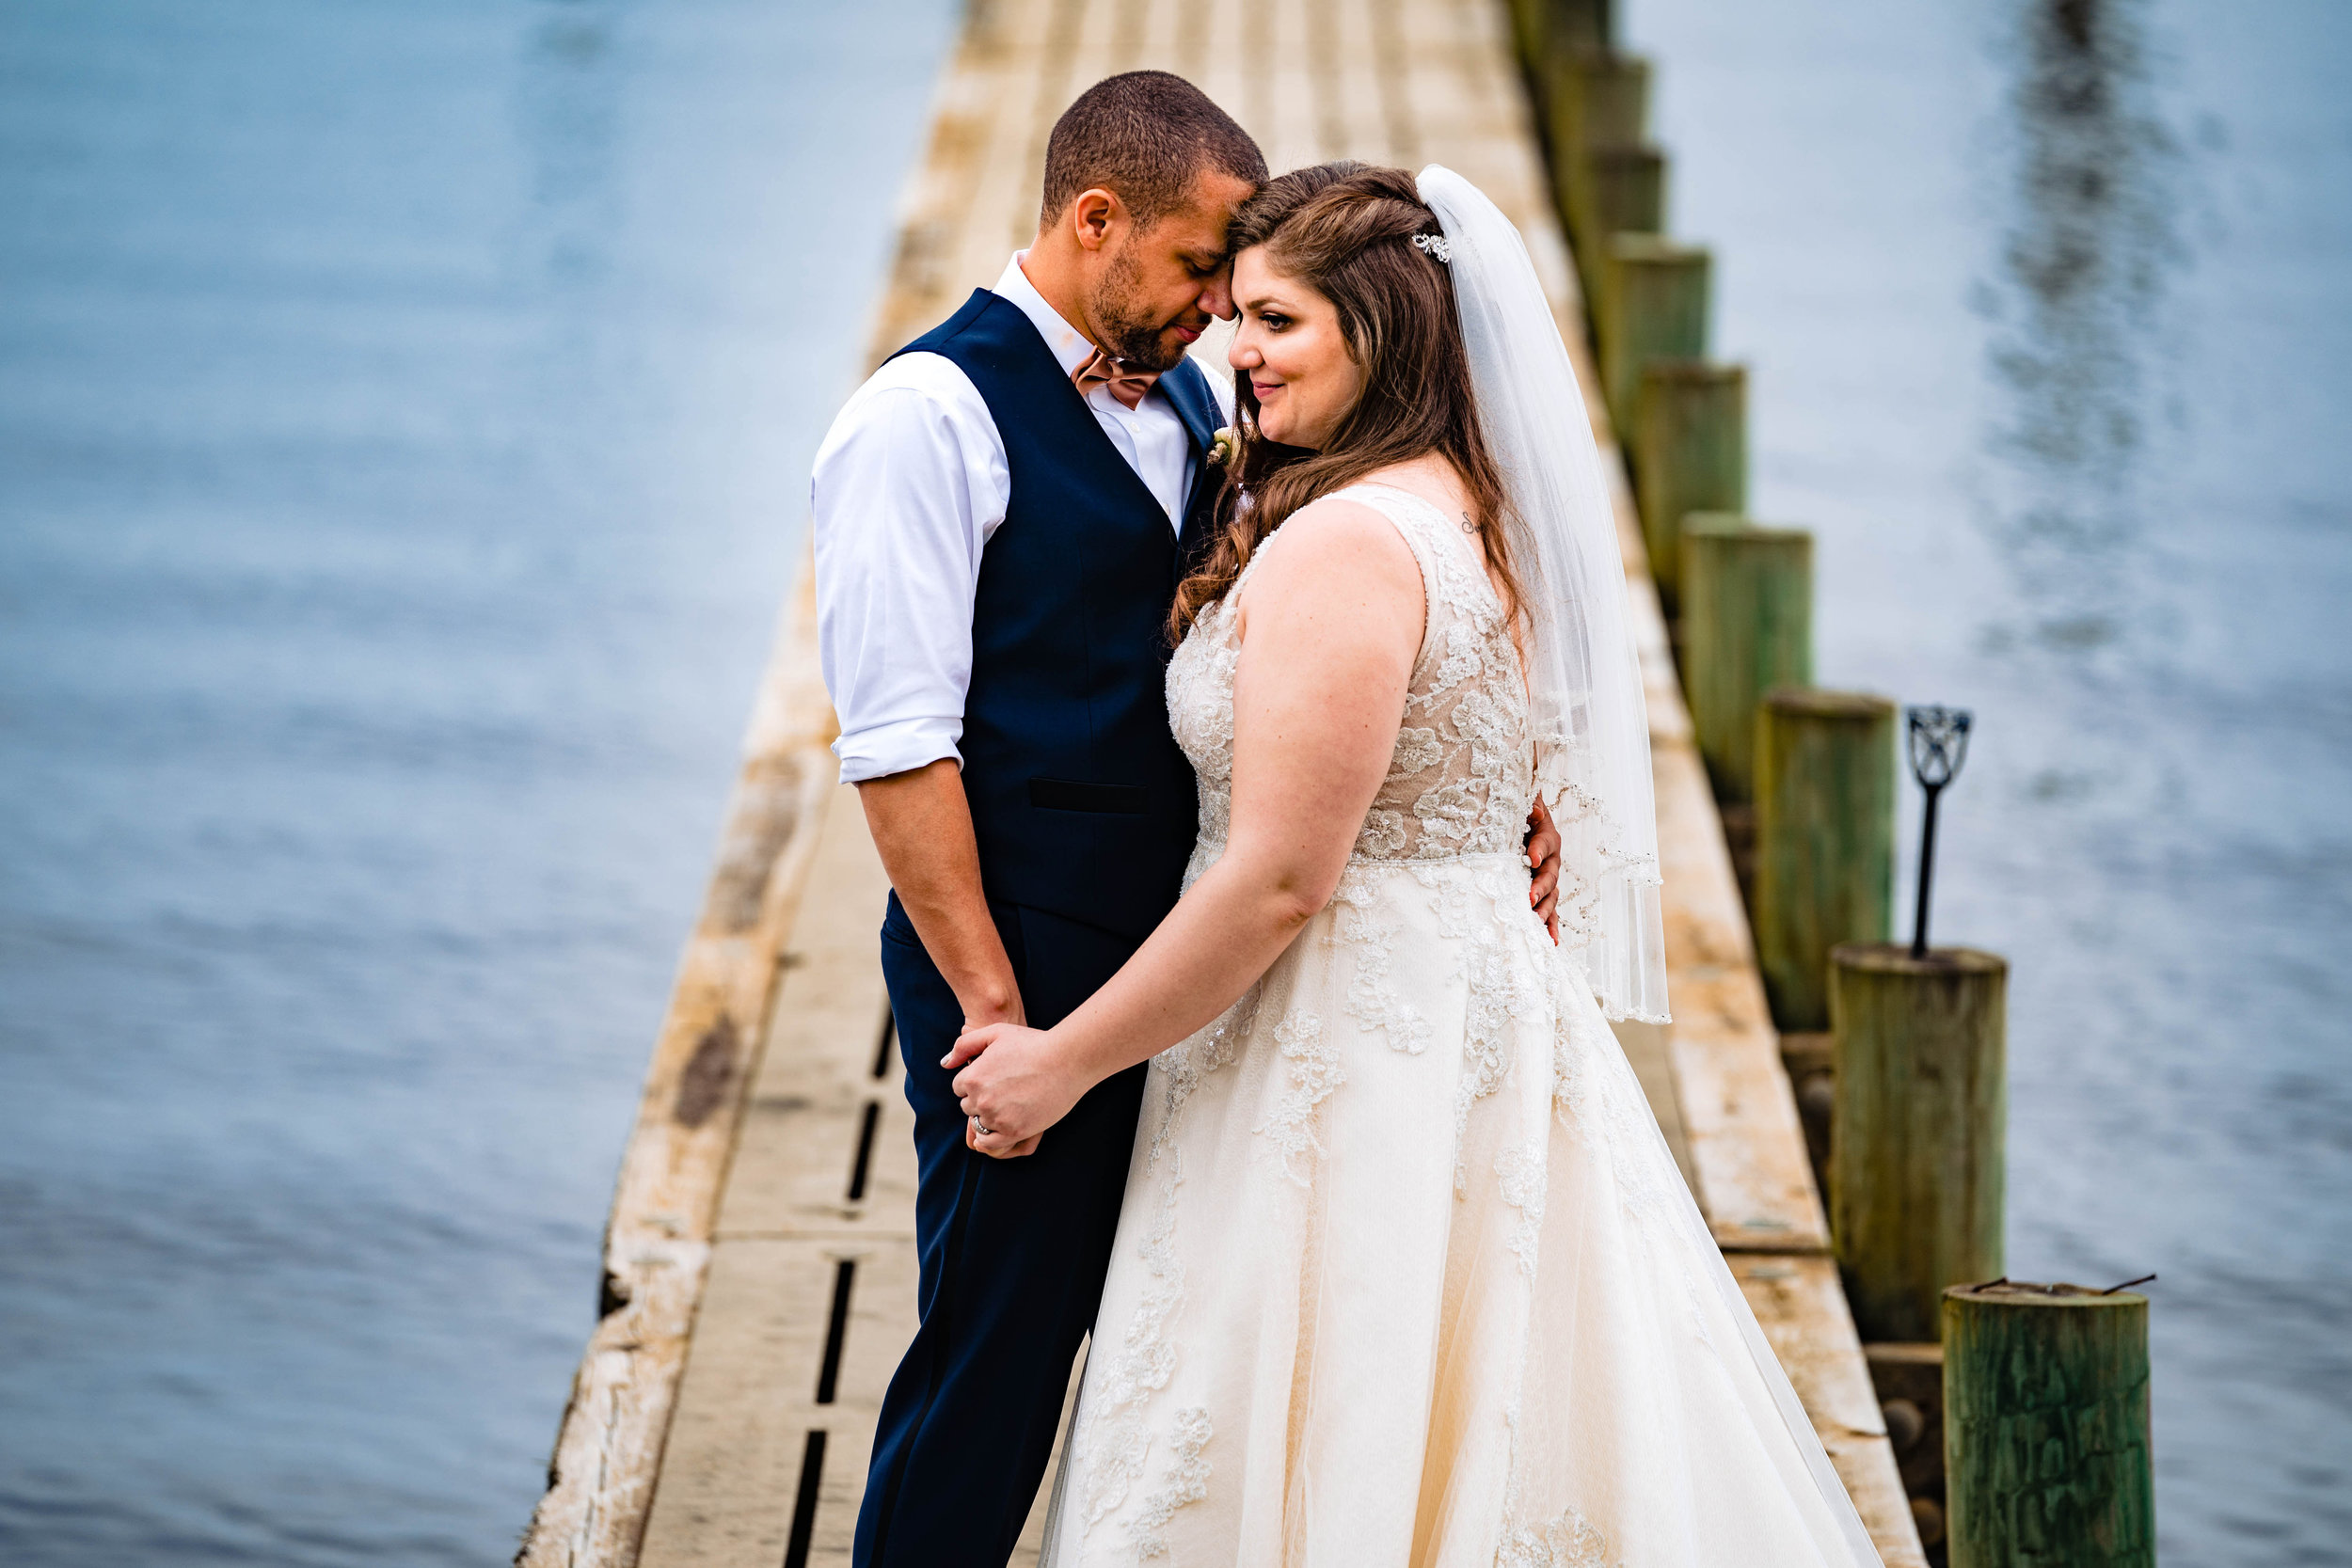 copper-ridge-on-the-neuse-wedding-001tephanie&Roberto-Wedding-479 (1).jpg